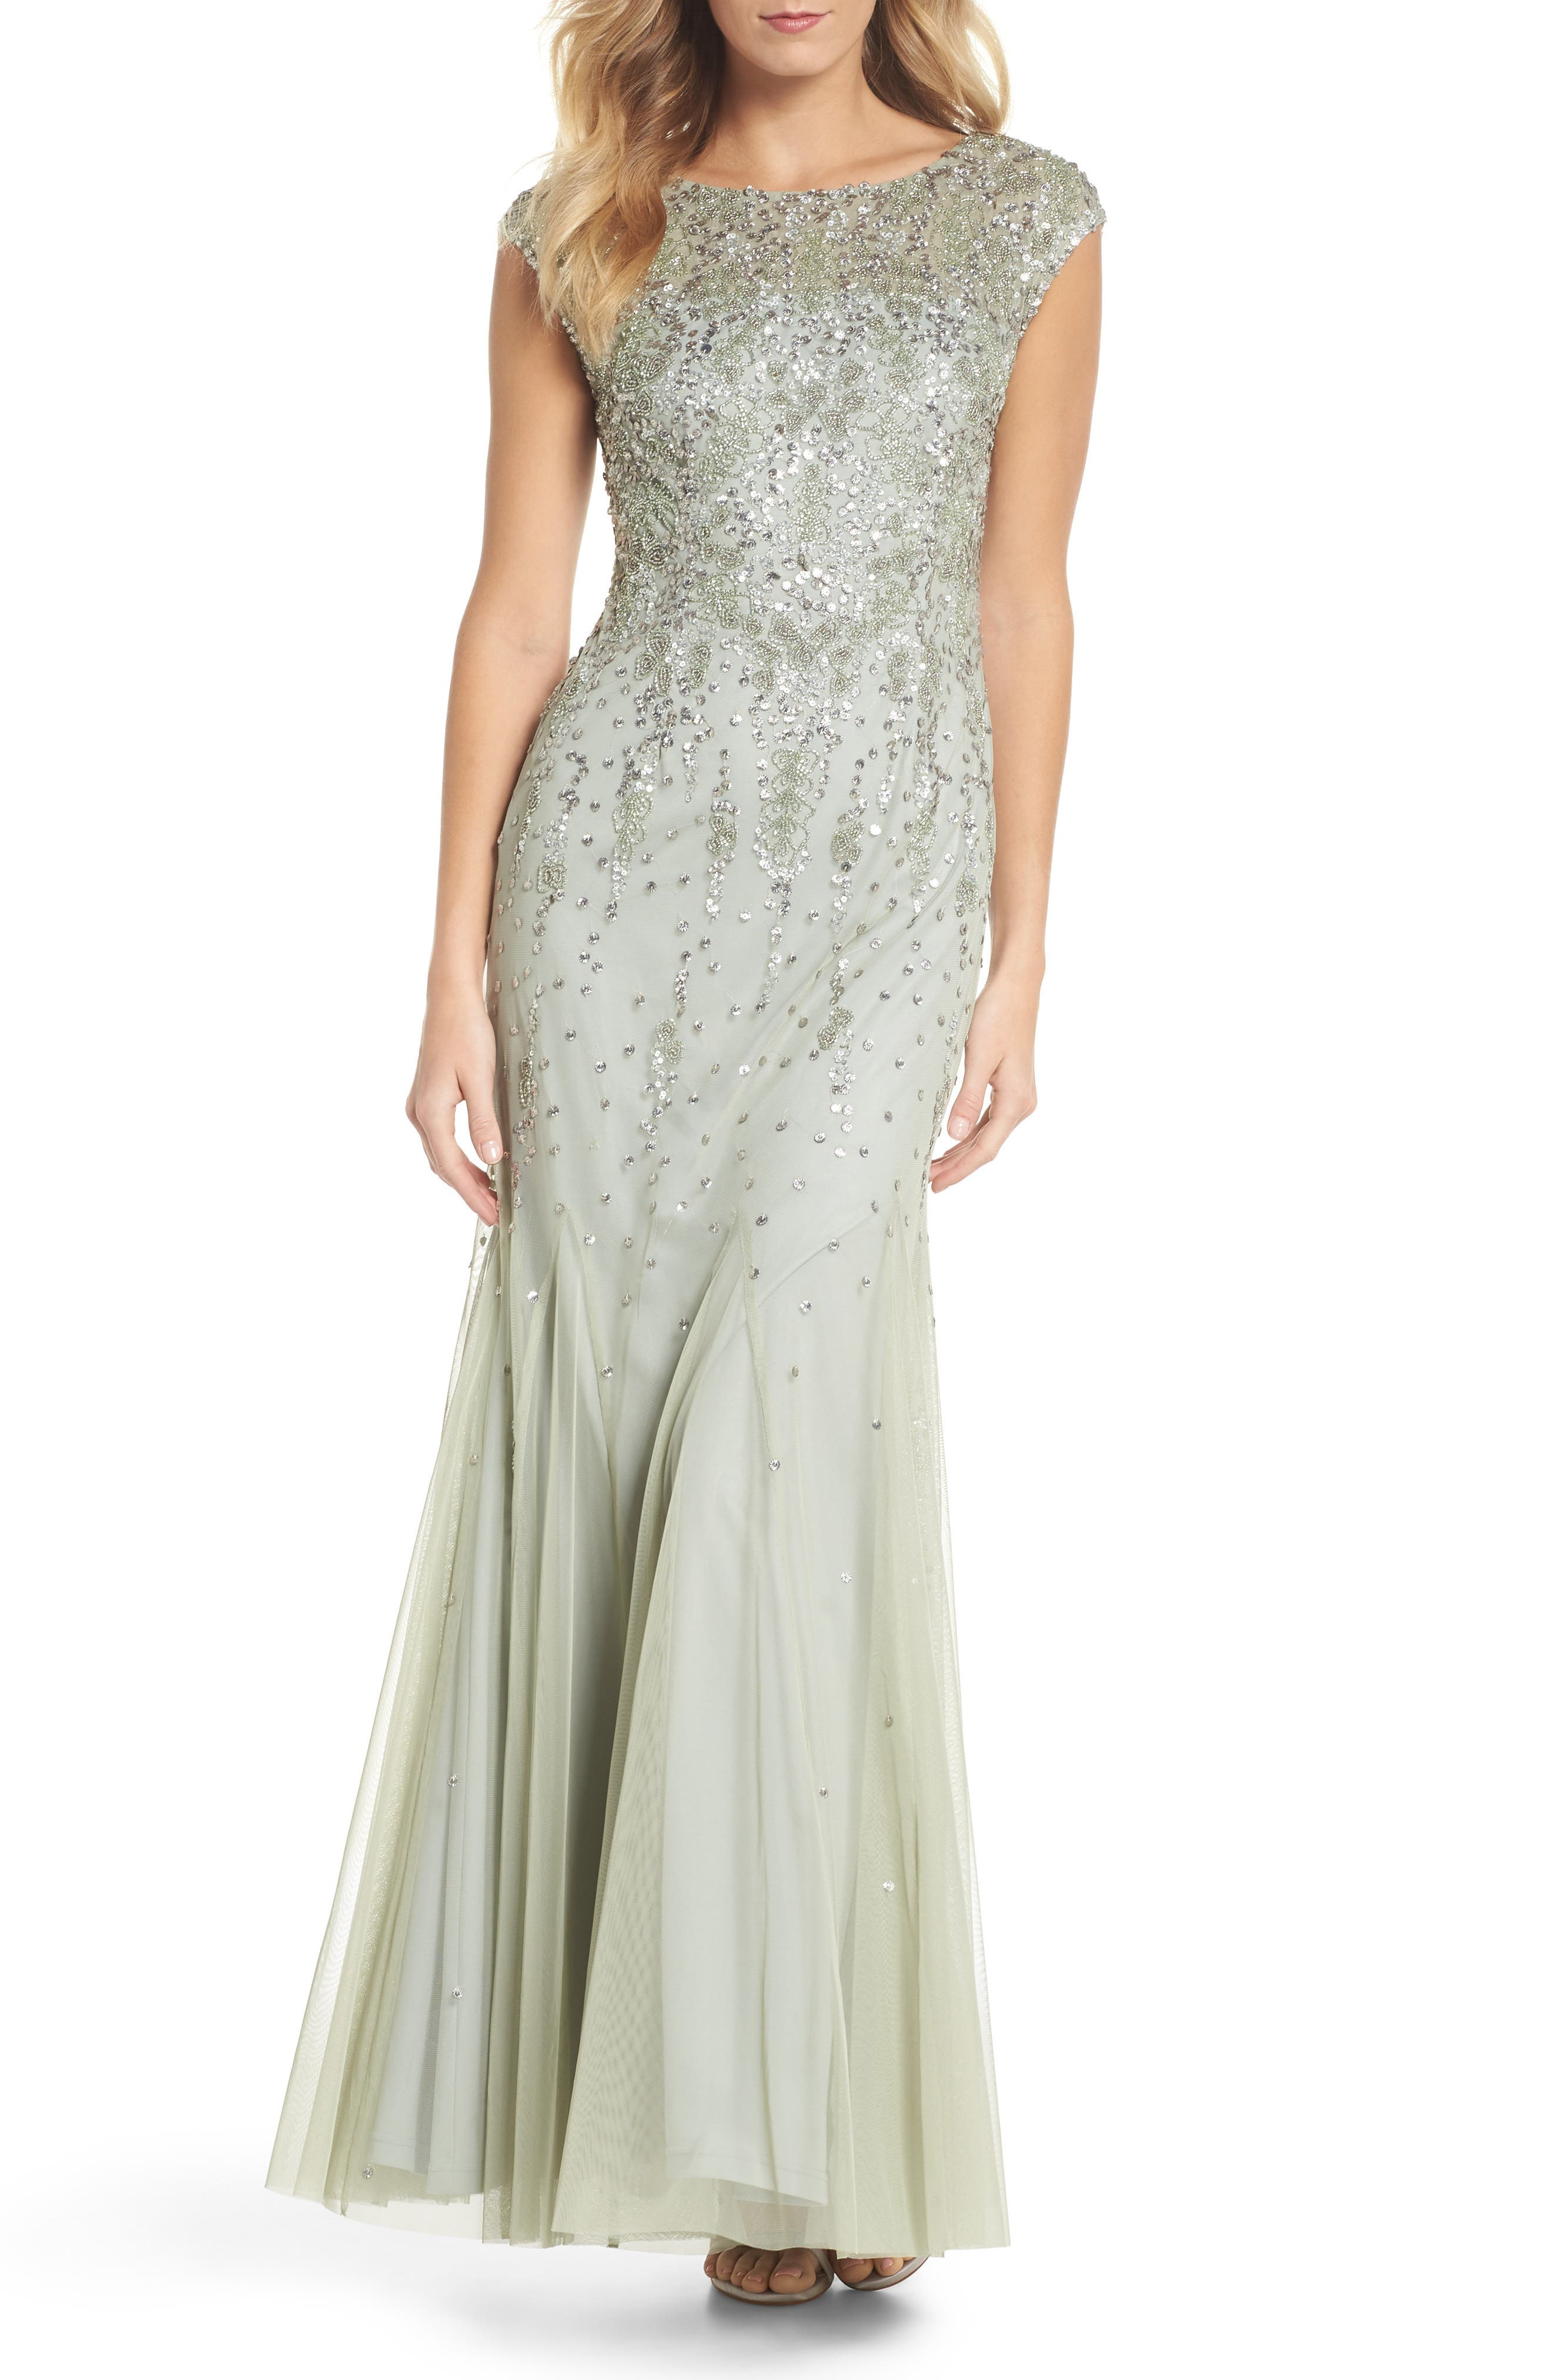 Beaded Mermaid Gown,                             Main thumbnail 1, color,                             330